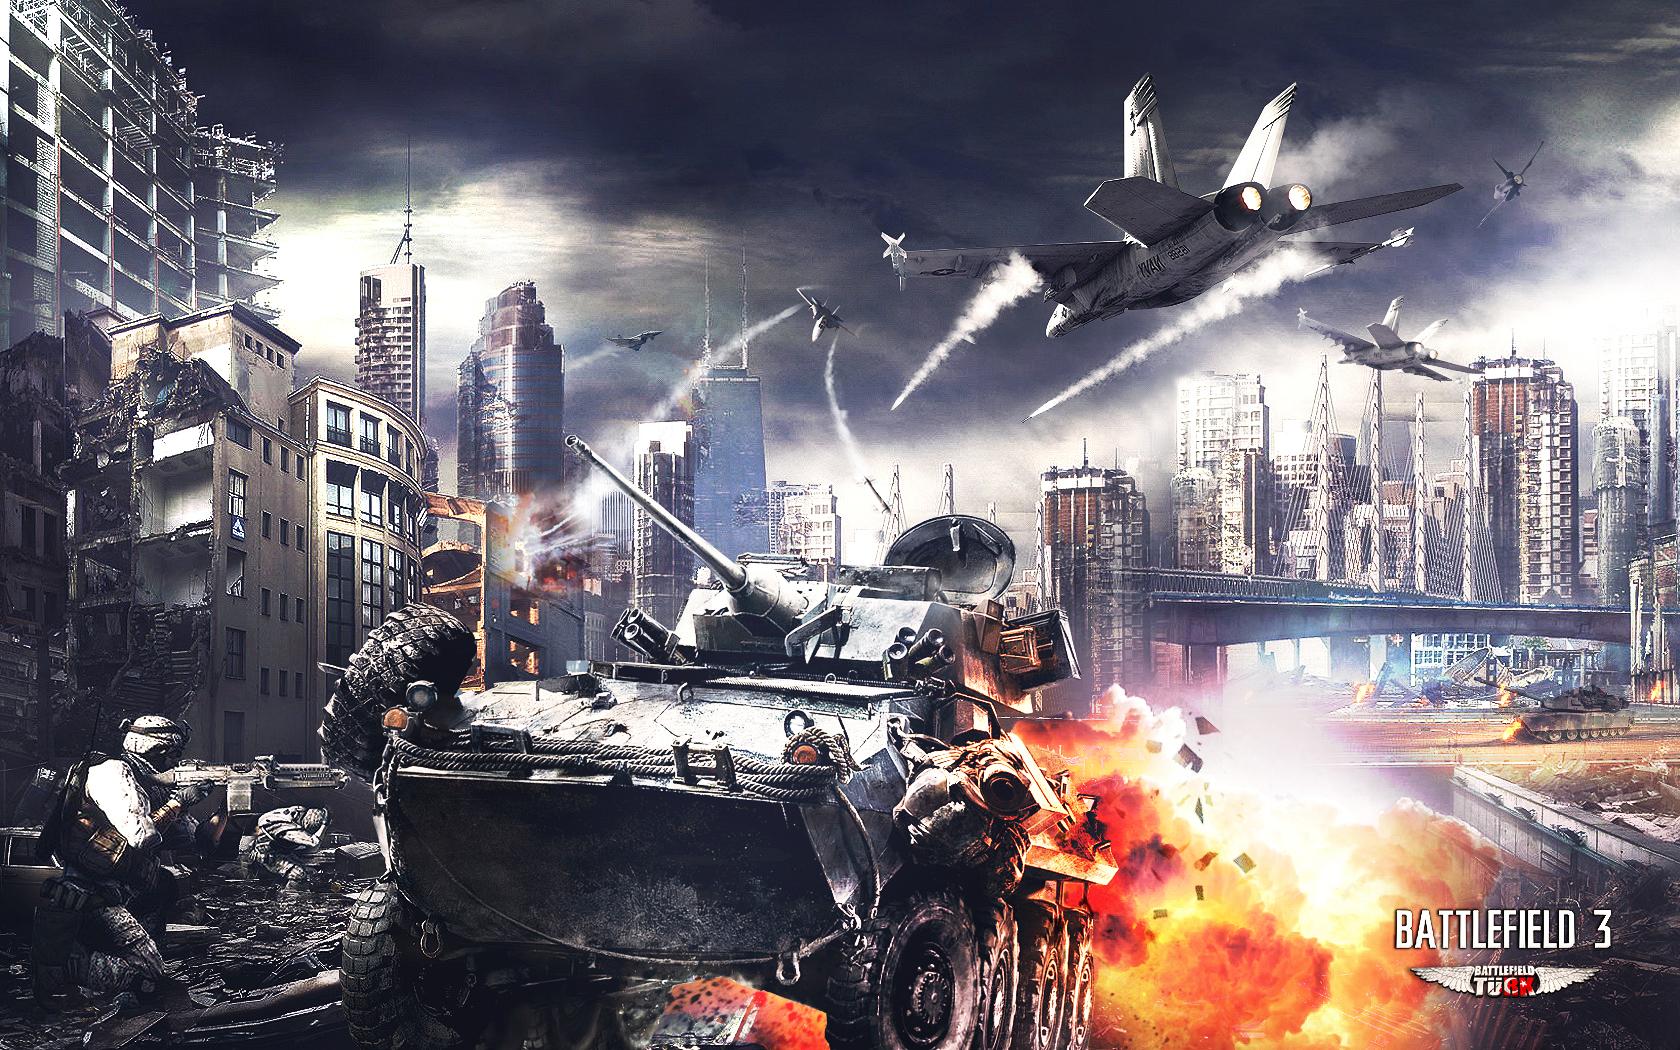 HD]Battlefield 3 Wallpapers Risen Sources 1680x1050